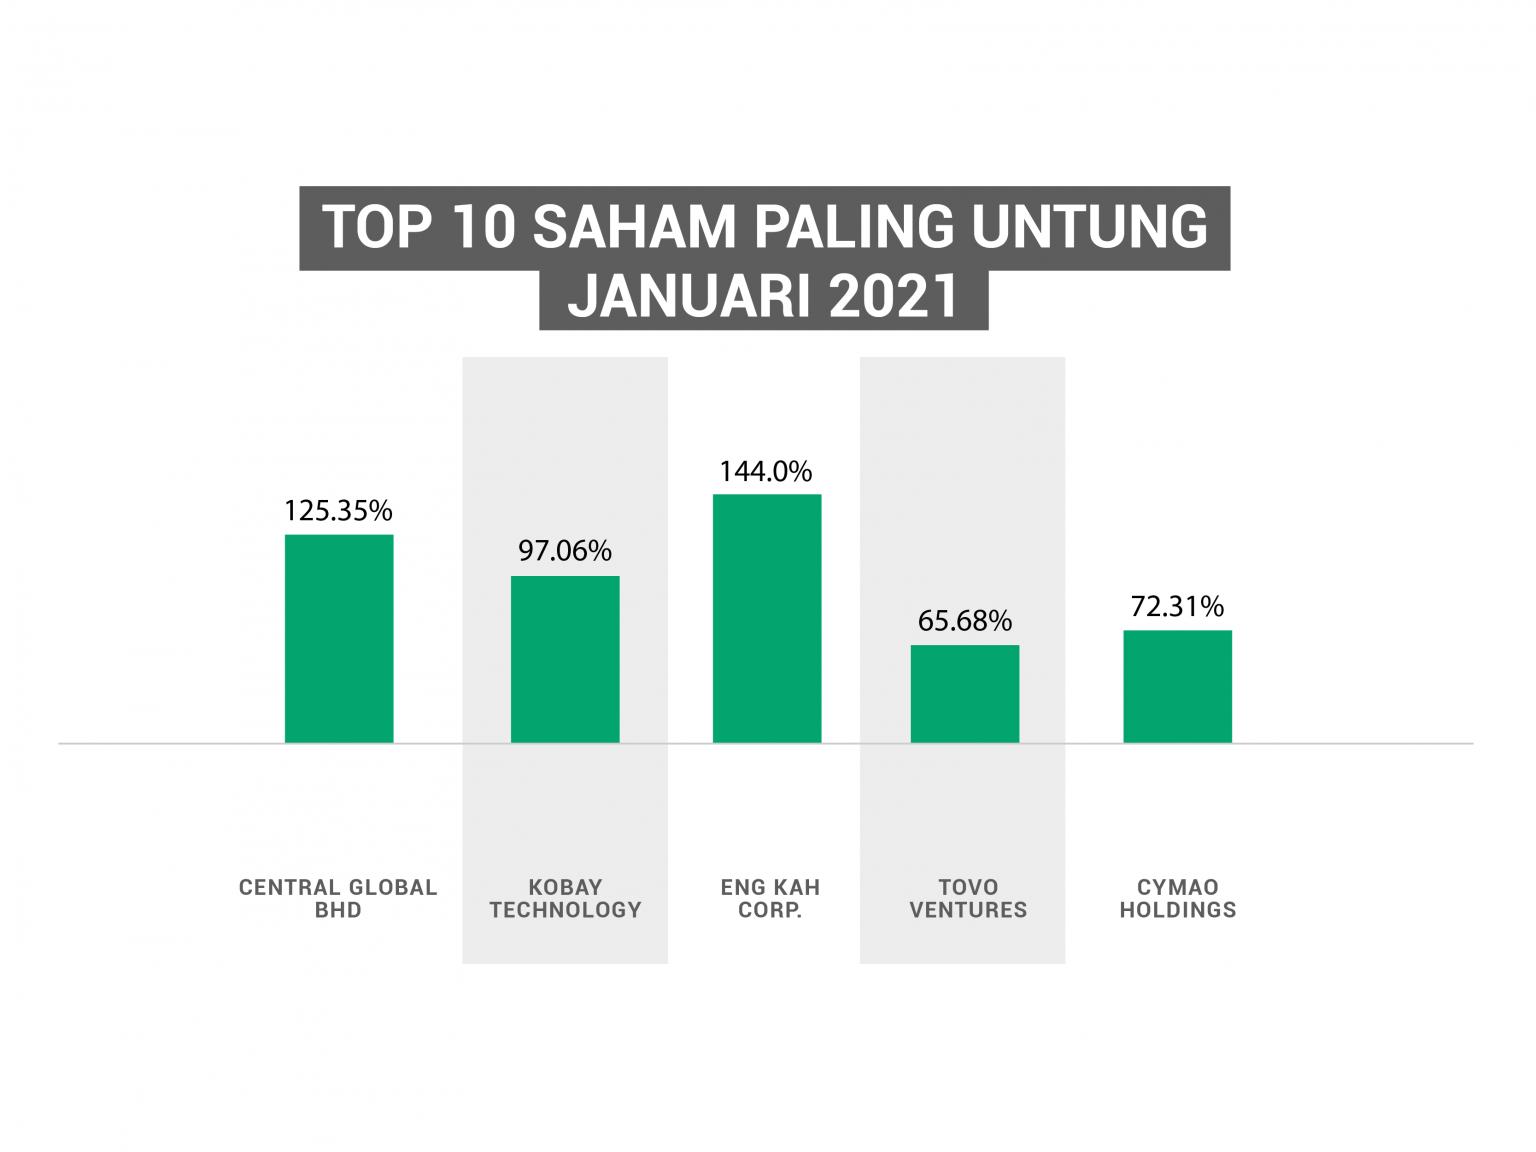 Top 10 Saham Patuh Syariah Paling Untung Januari 2021 ...